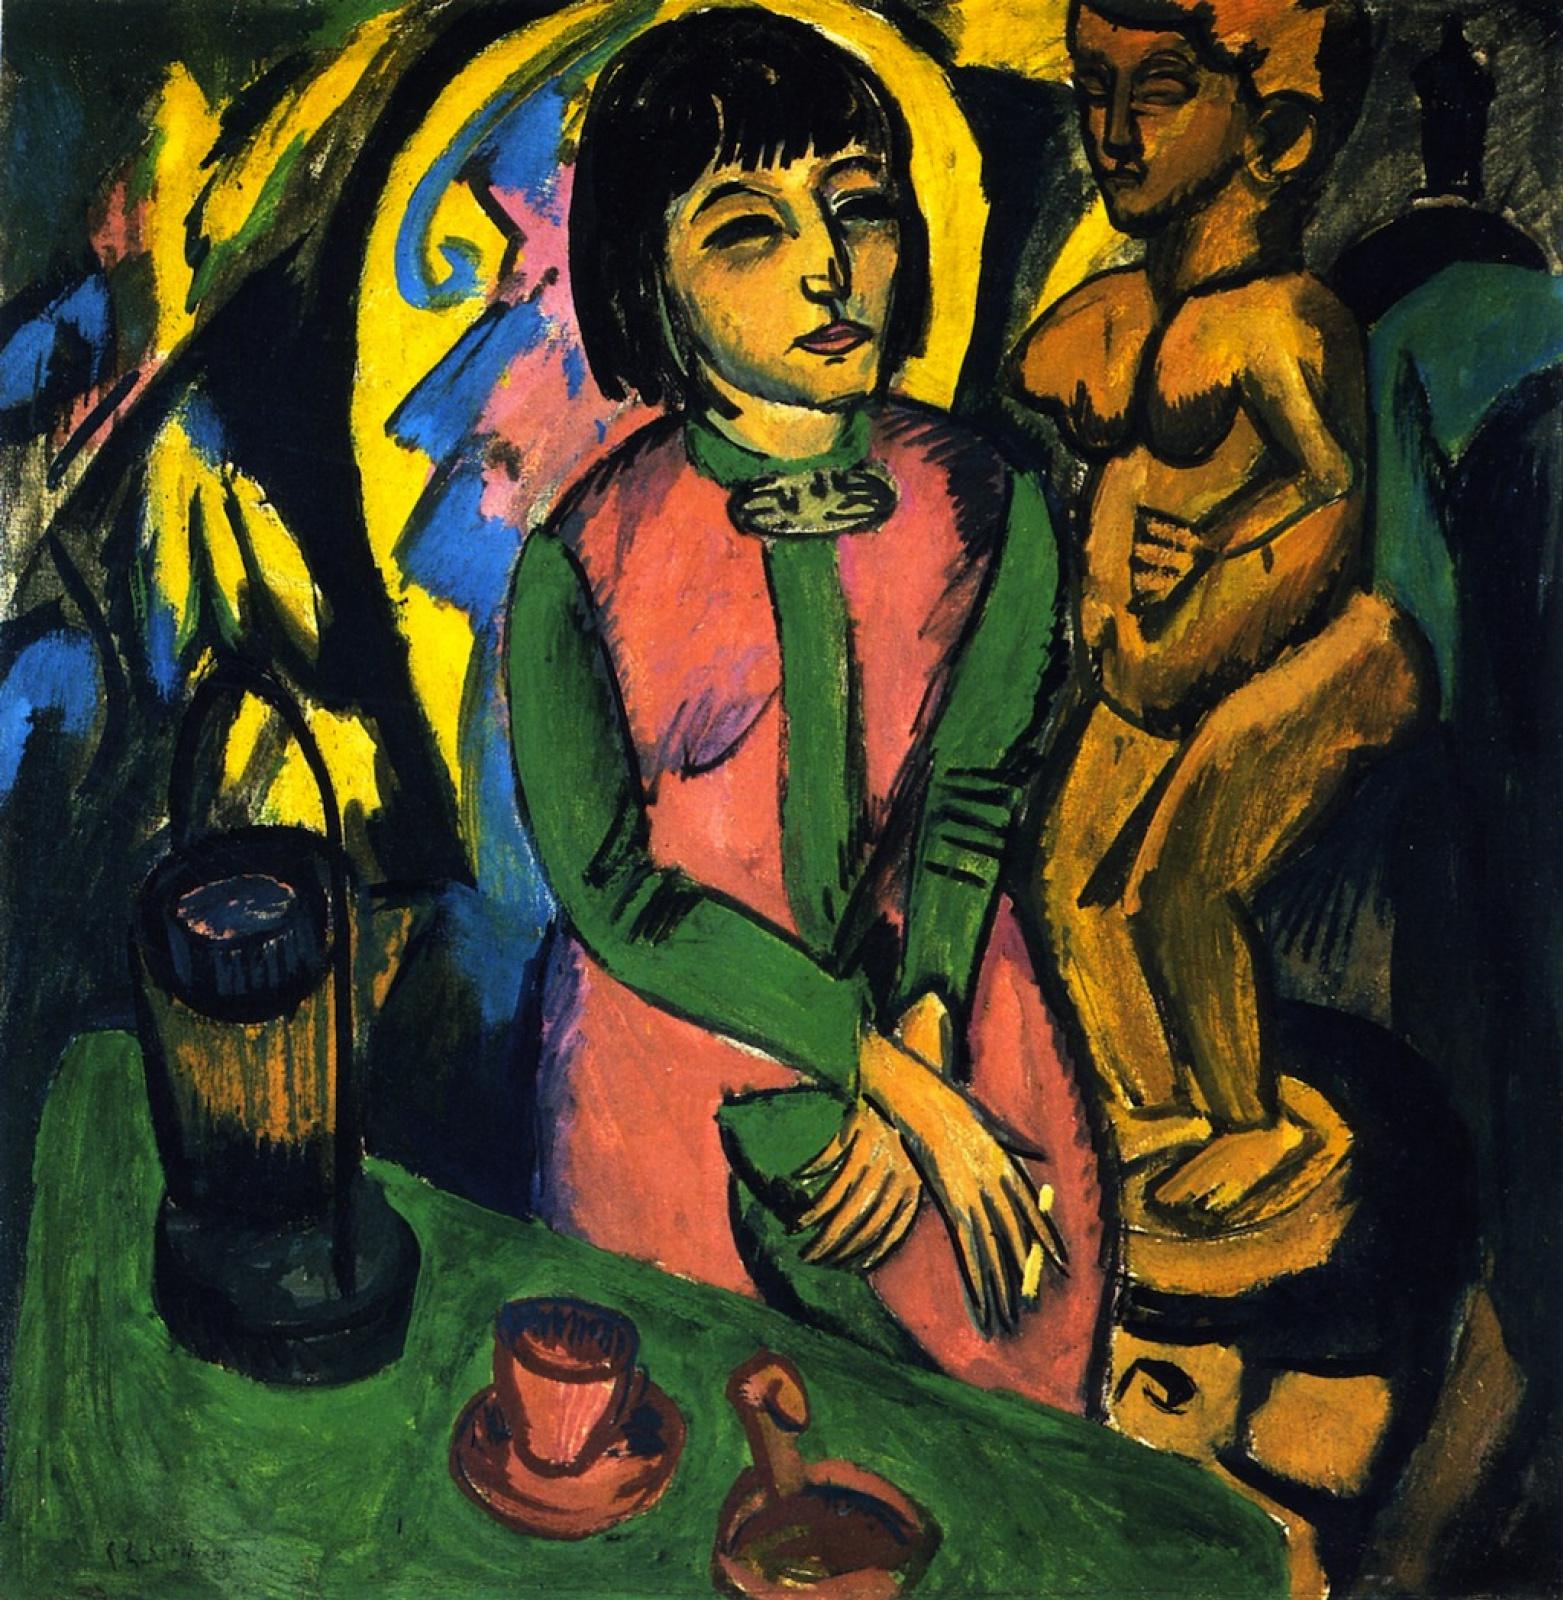 Ernst Ludwig Kirchner. Portrait of a woman near a wooden sculpture